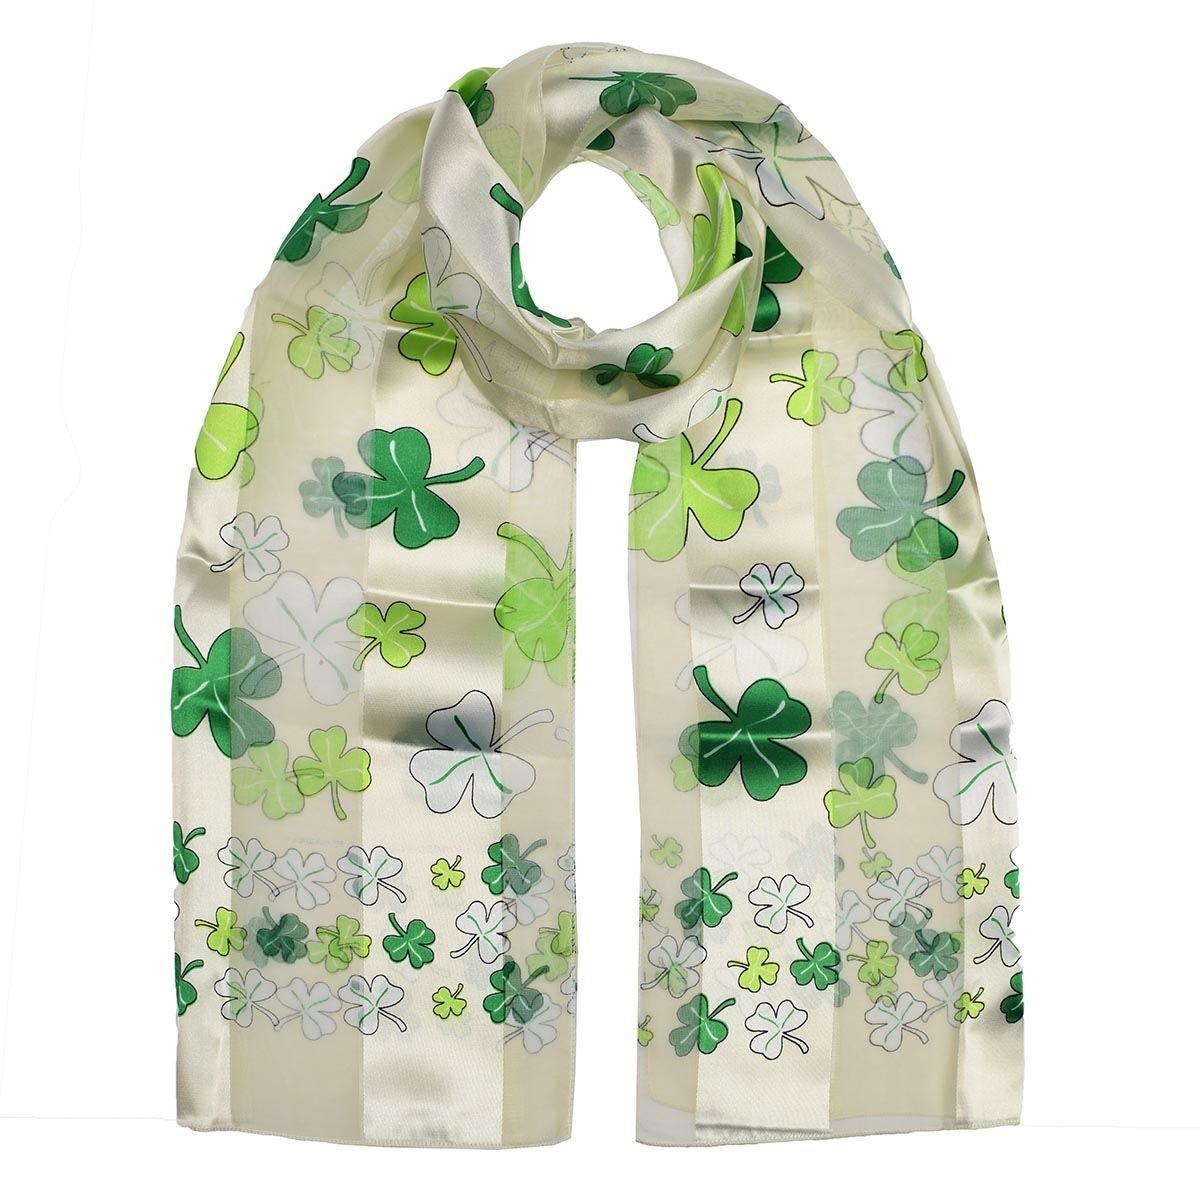 Shamrock Print Scarf Small Lucky Celtic Clover Irish ST Patrick/'s Day Scarves